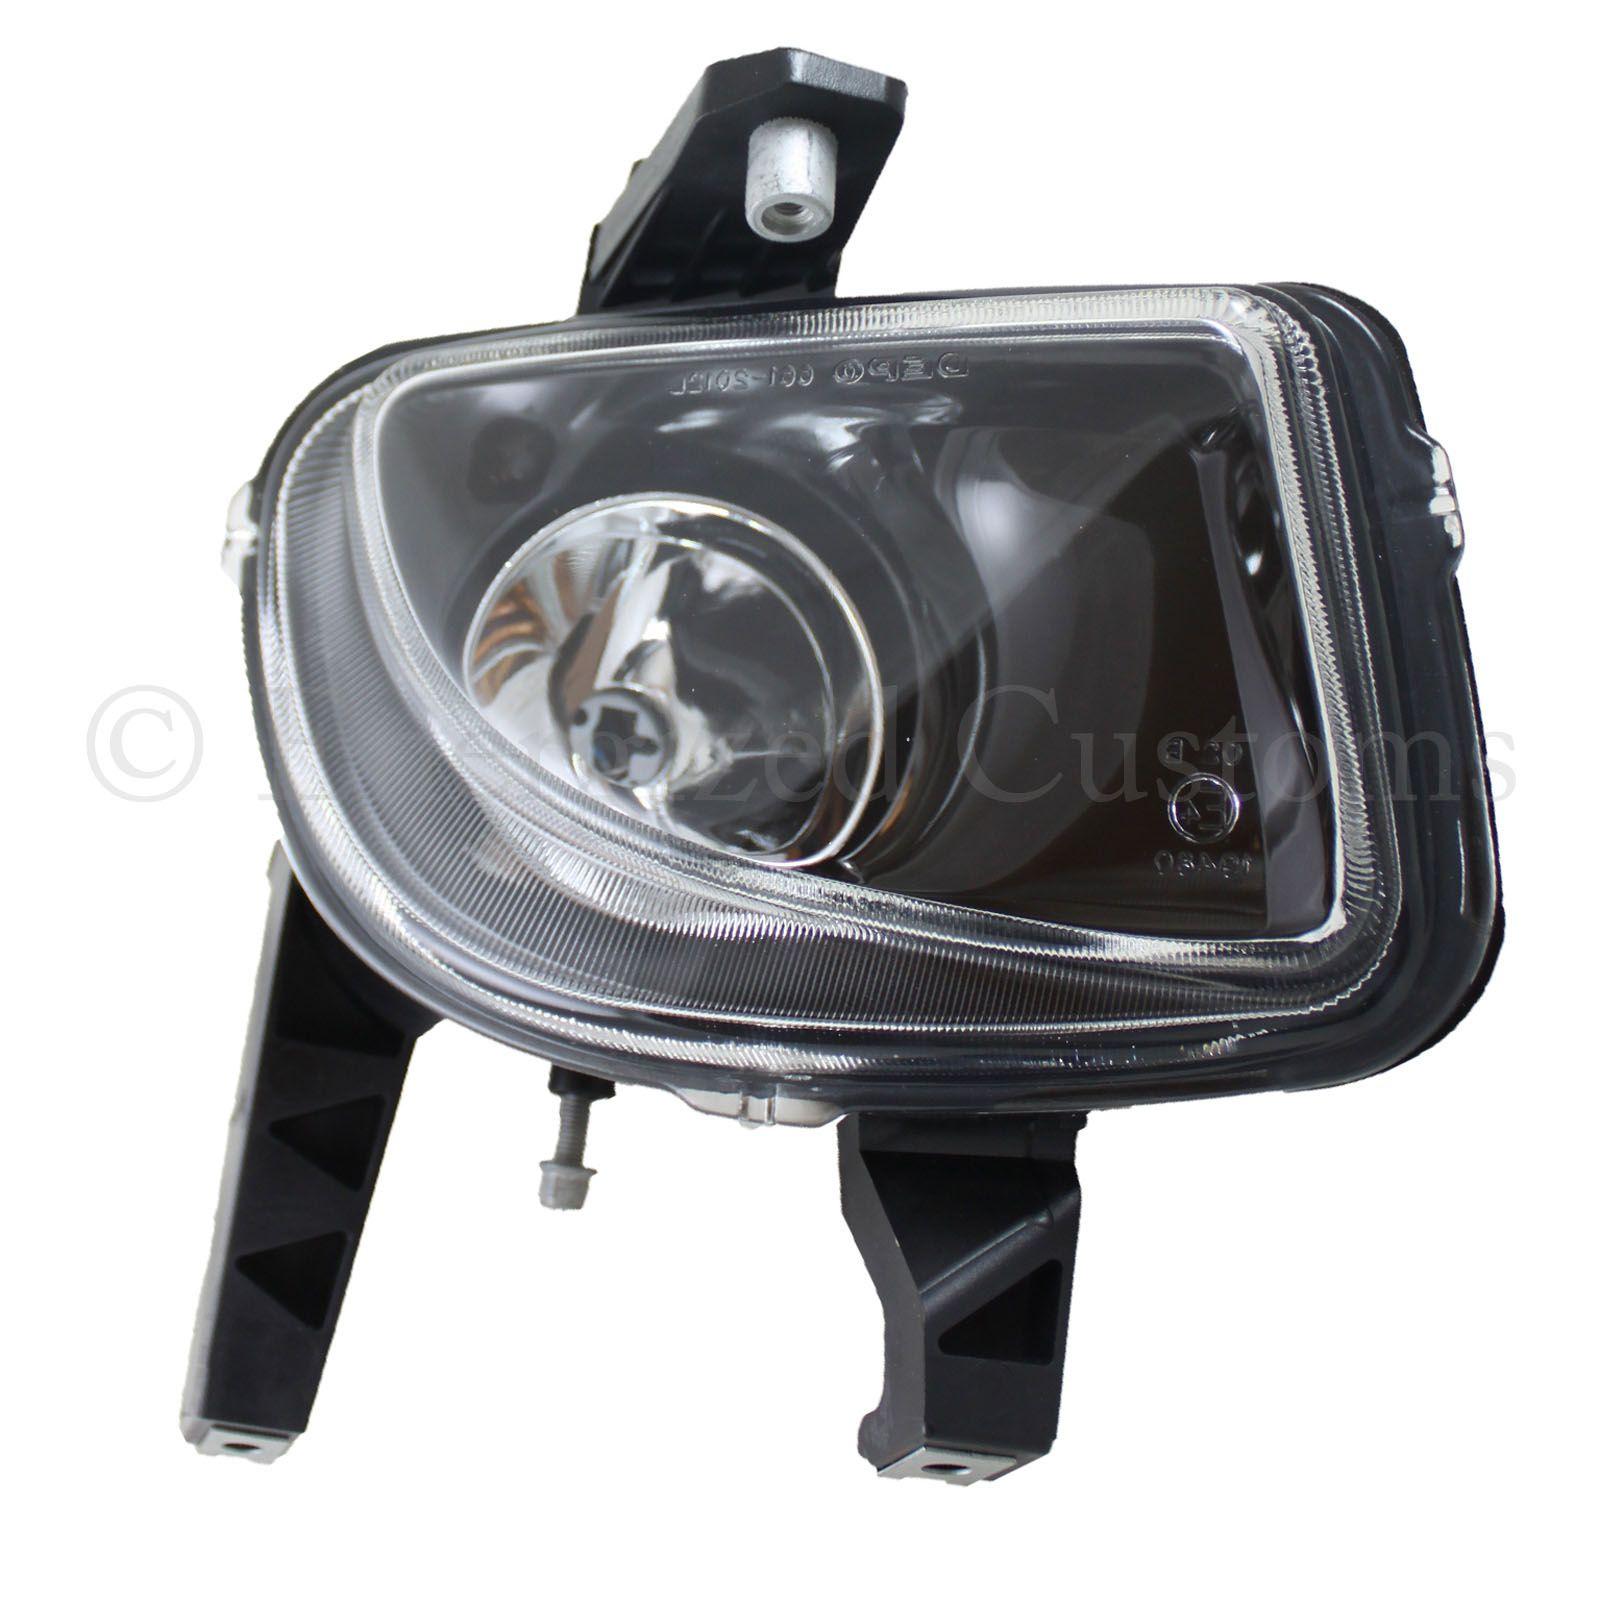 FIAT GRANDE PUNTO 2006-2010 FRONT FOG LIGHT LAMP RIGHT SIDE DRIVER SIDE O//S